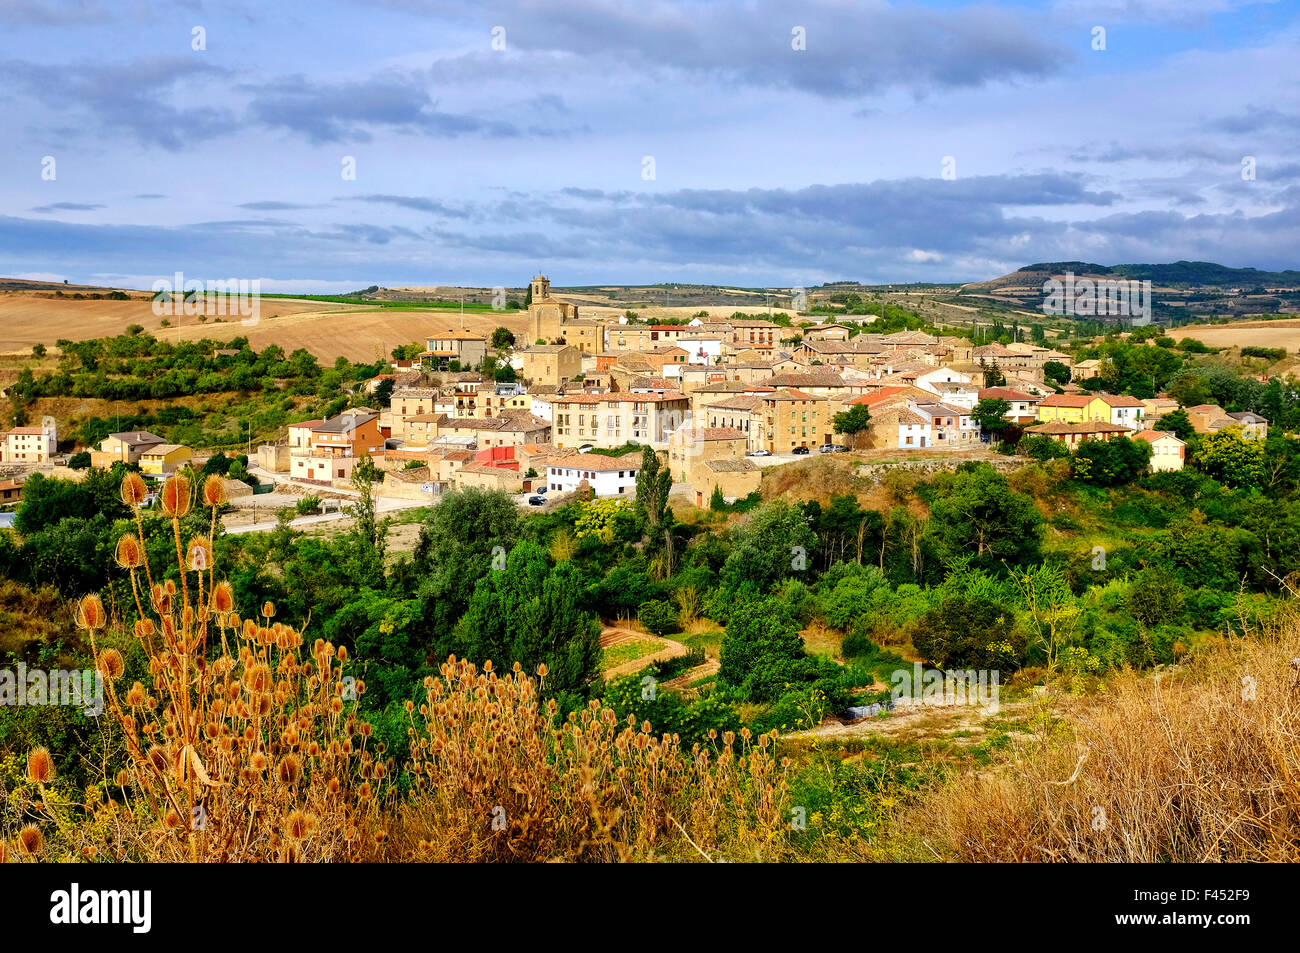 View of Torres del Rio, Navarre, Spain Stock Photo